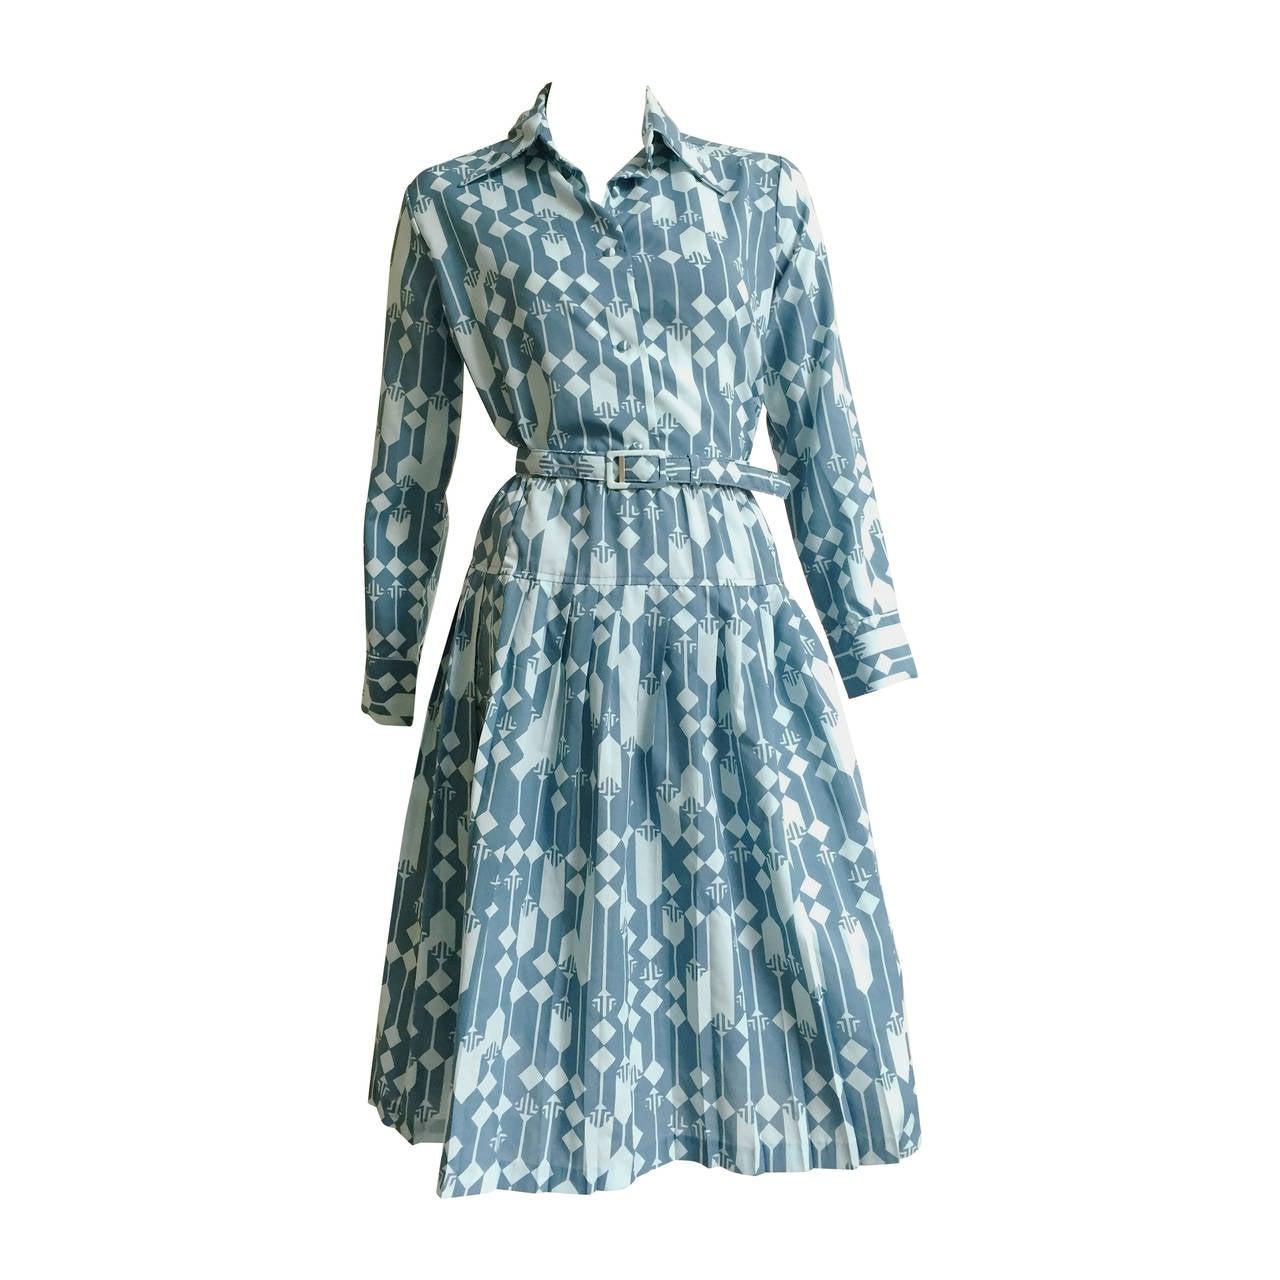 Lanvin Blouse, Skirt & Belt Dress Set Size 8. For Sale